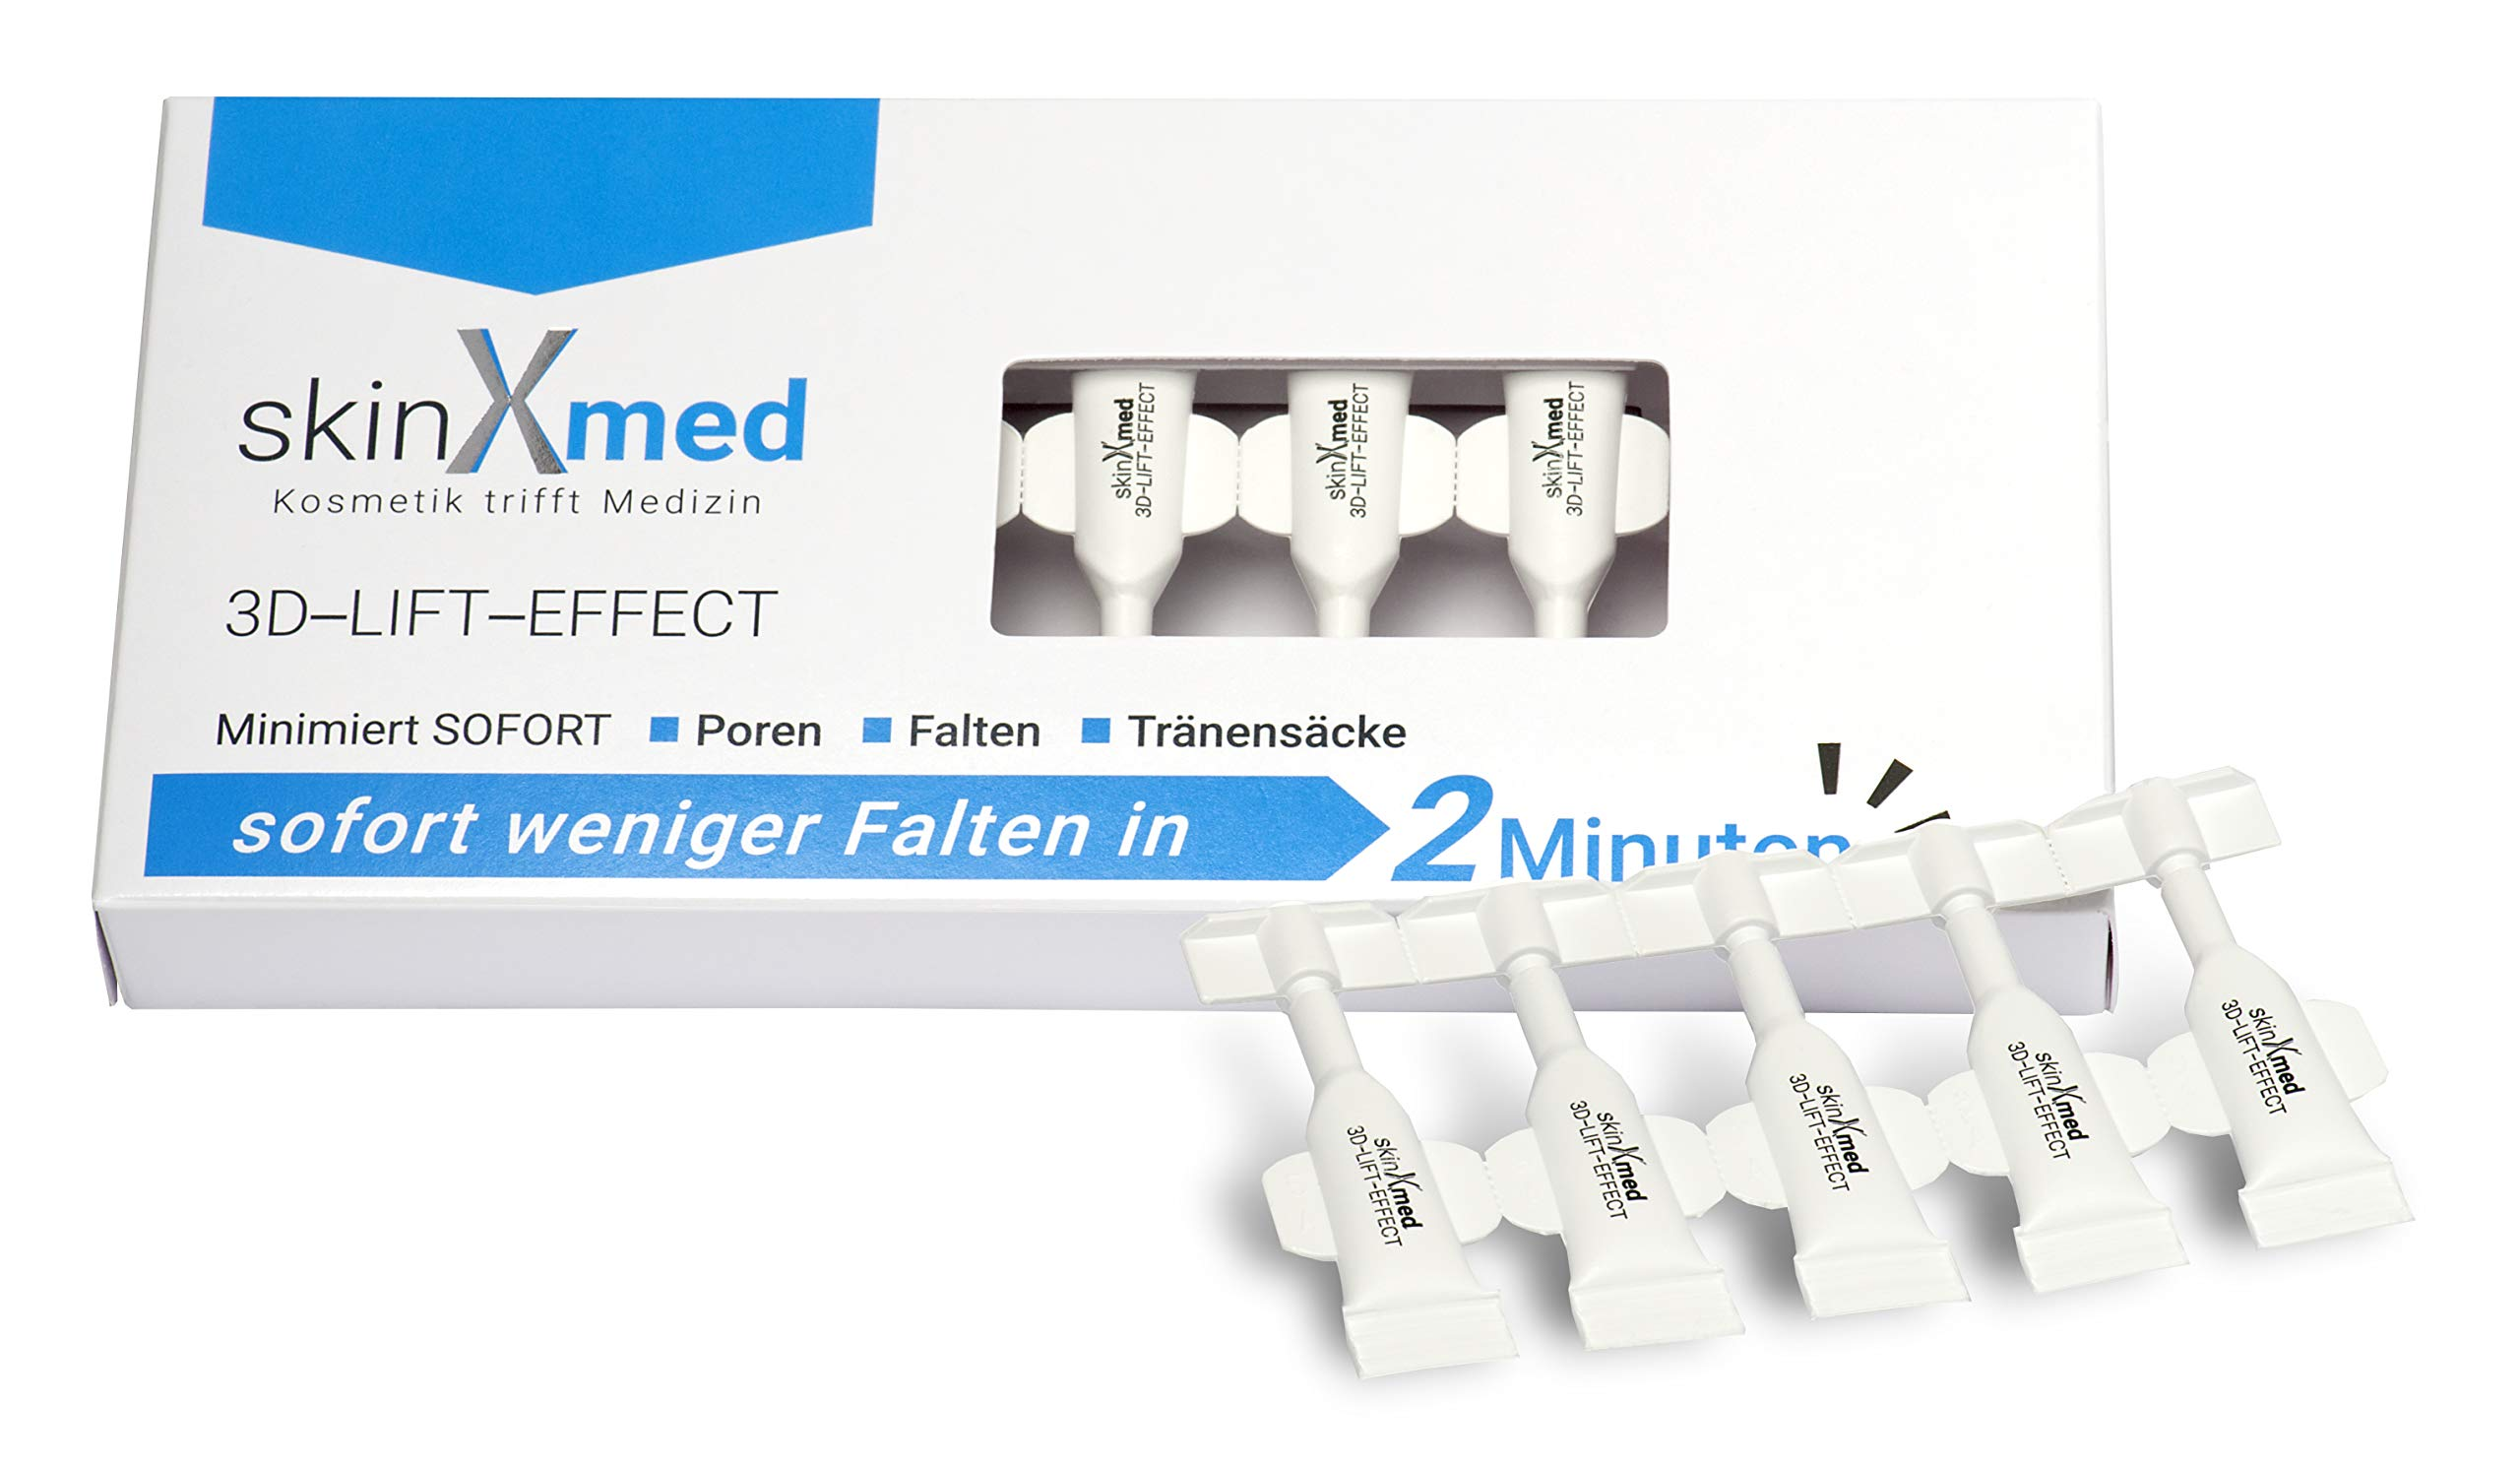 SkinXmed ampollas faciales efecto 3D Lifting inmediato | Rellenador intensivo anti-arrugas cara, ojos, cuello, escote | Crema acción flash 2 min | Suaviza poros | Pullulan, goma de acacia 10 monodosis